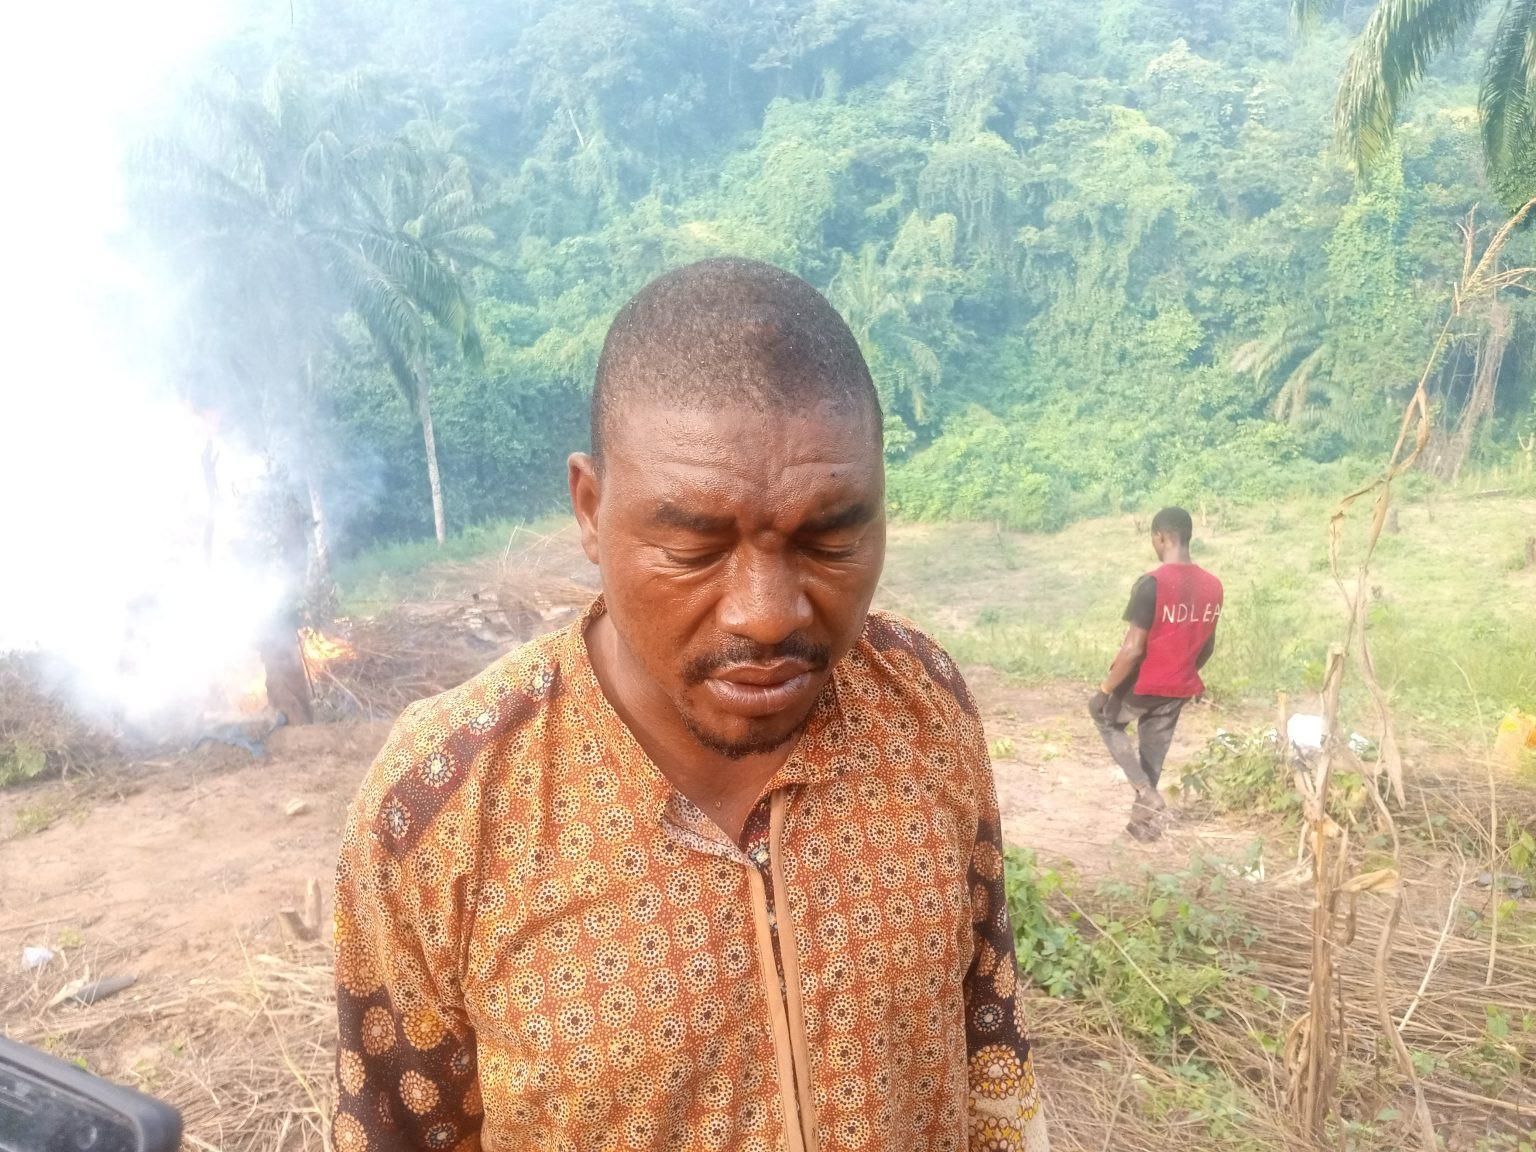 Suspects arrested as NDLEA destroys cannabis plantation worth over N1.5bn in Kogi